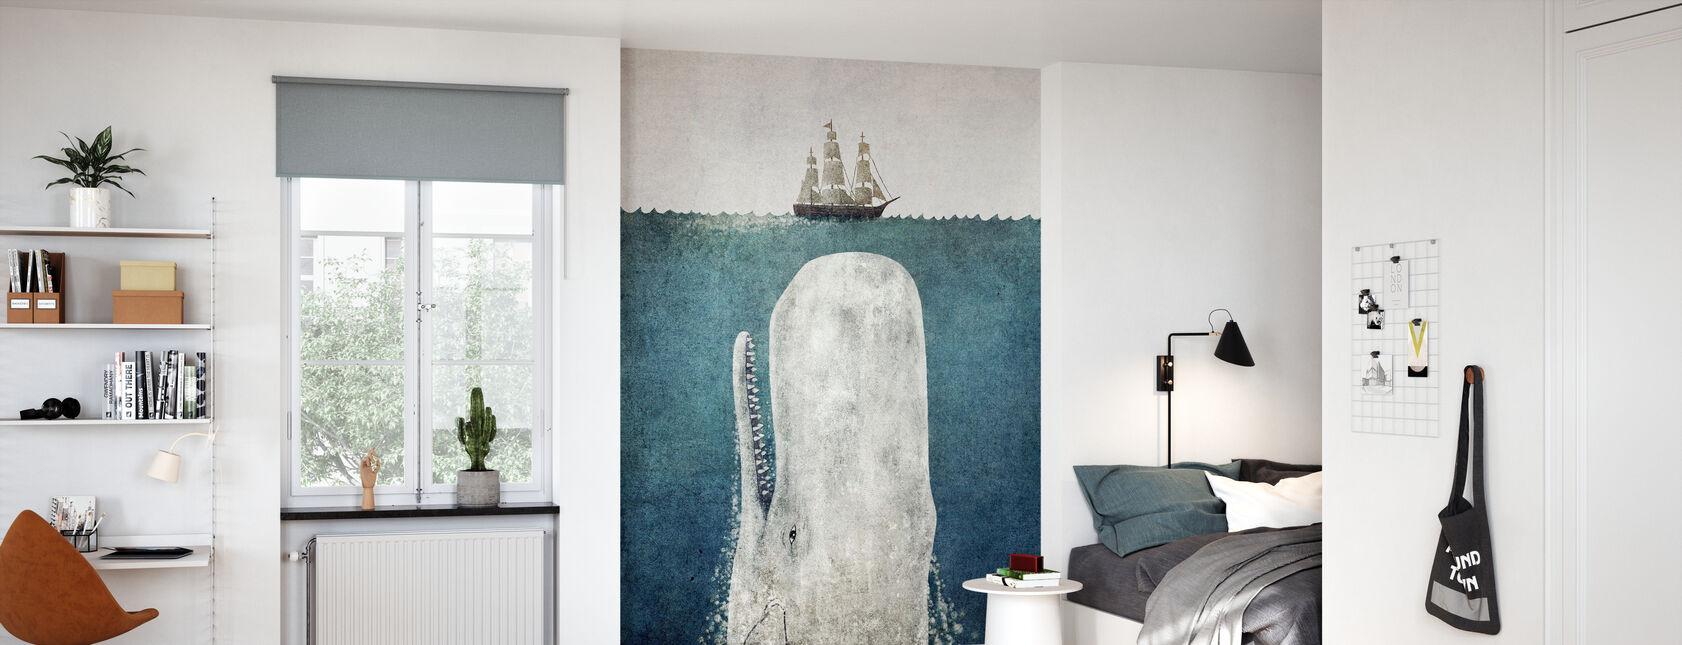 Whale Vintage - Wallpaper - Kids Room